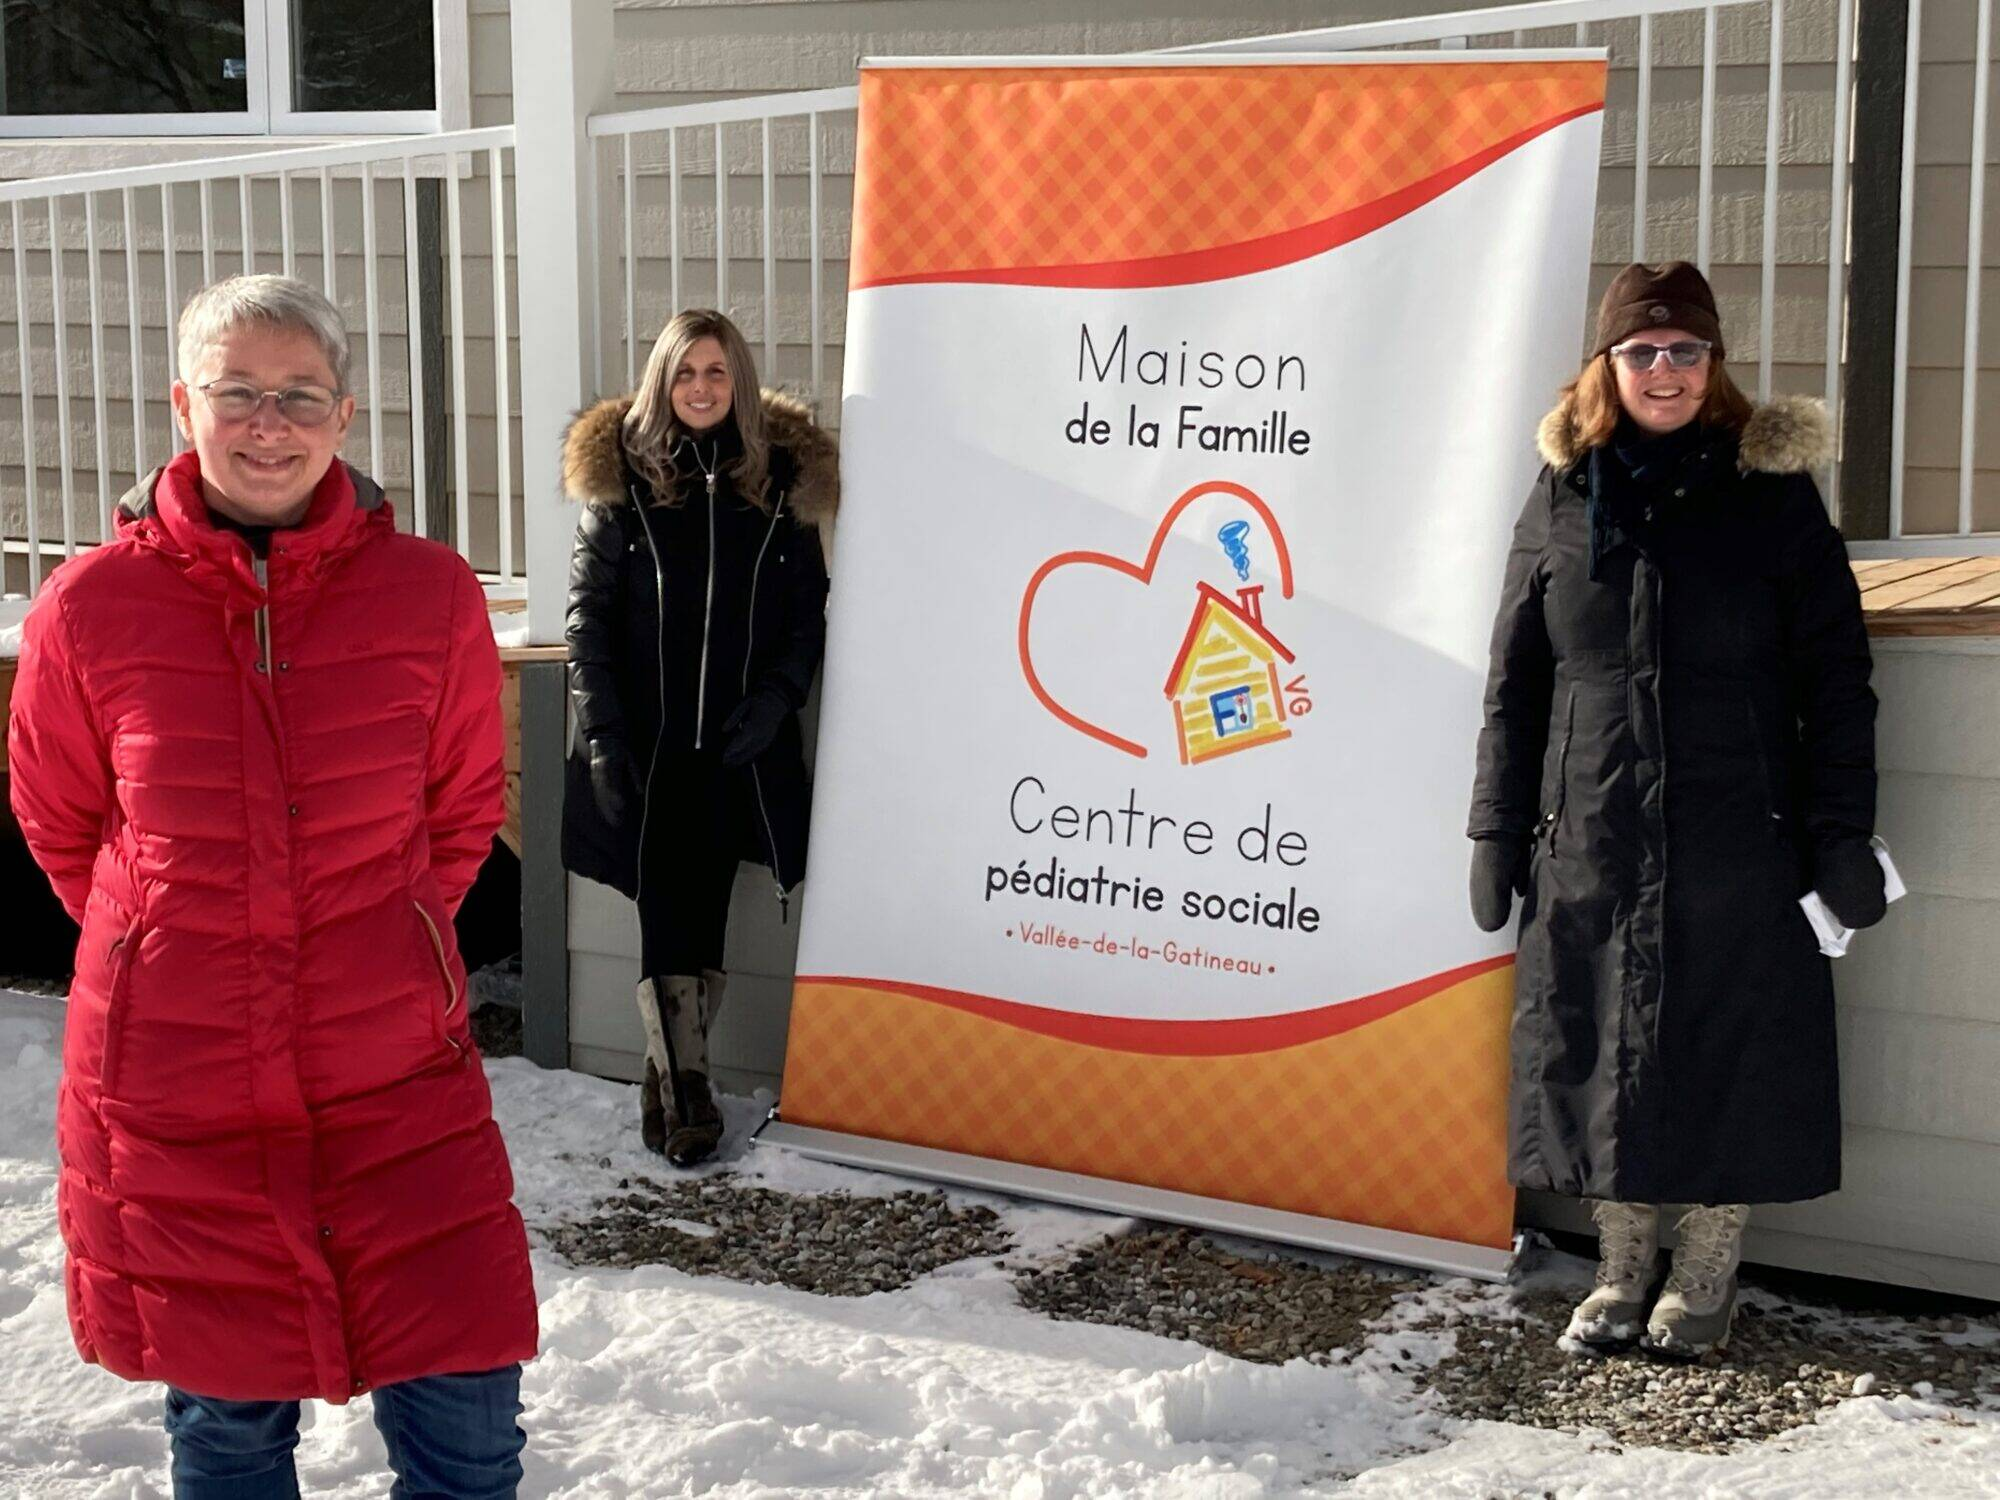 Guignolée centre de pédiatrie sociale